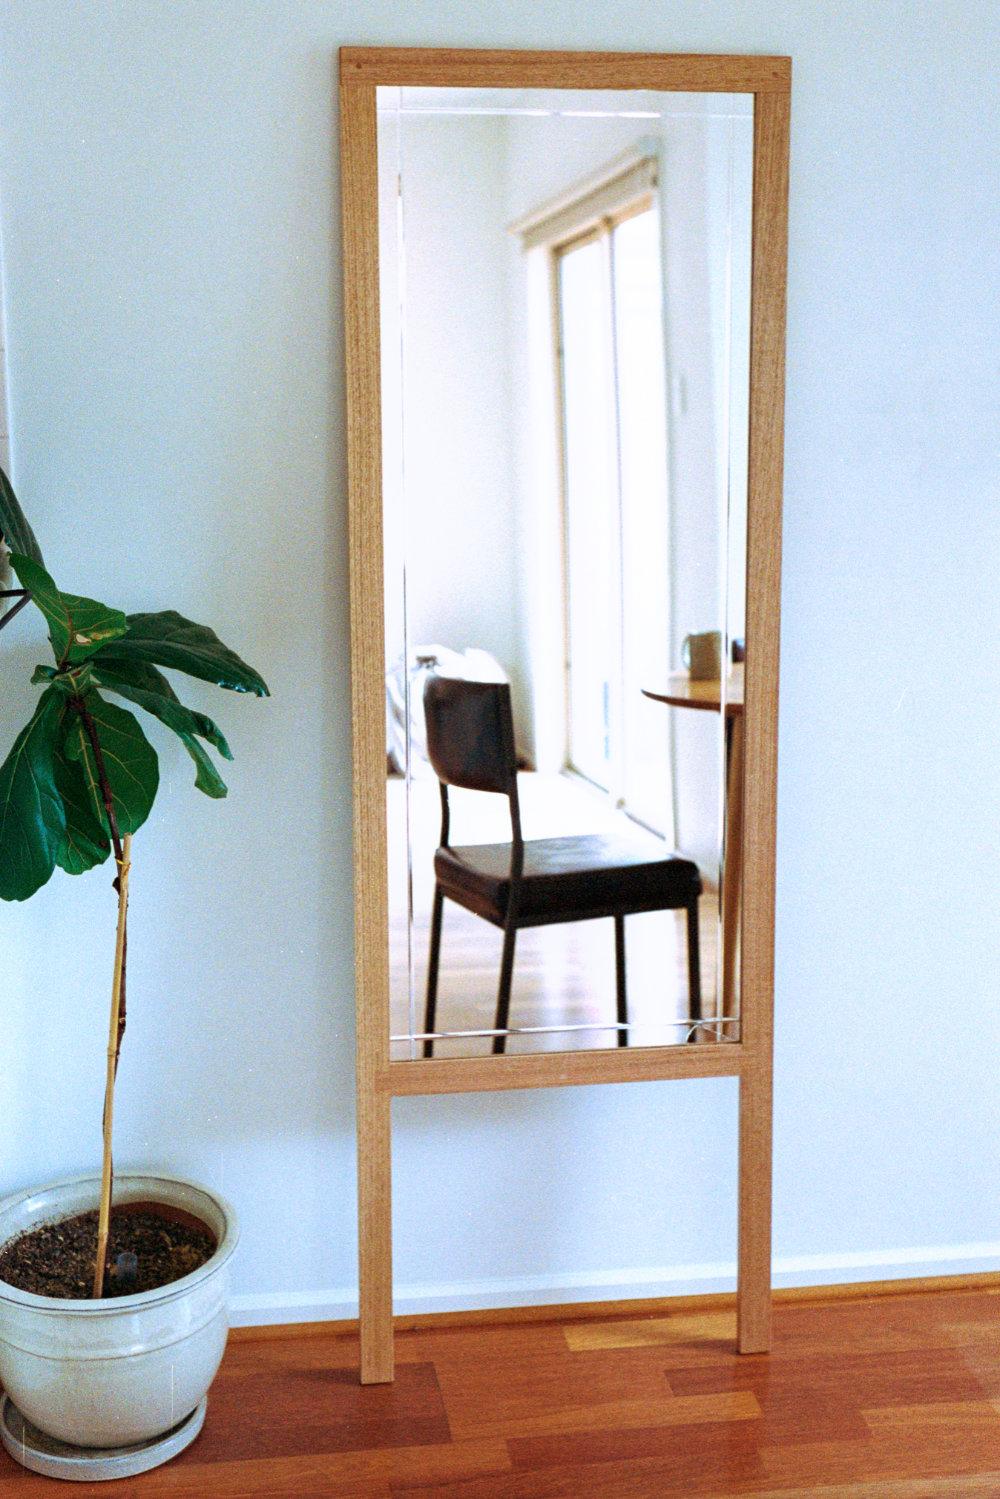 Oak framed freestanding leaning mirror